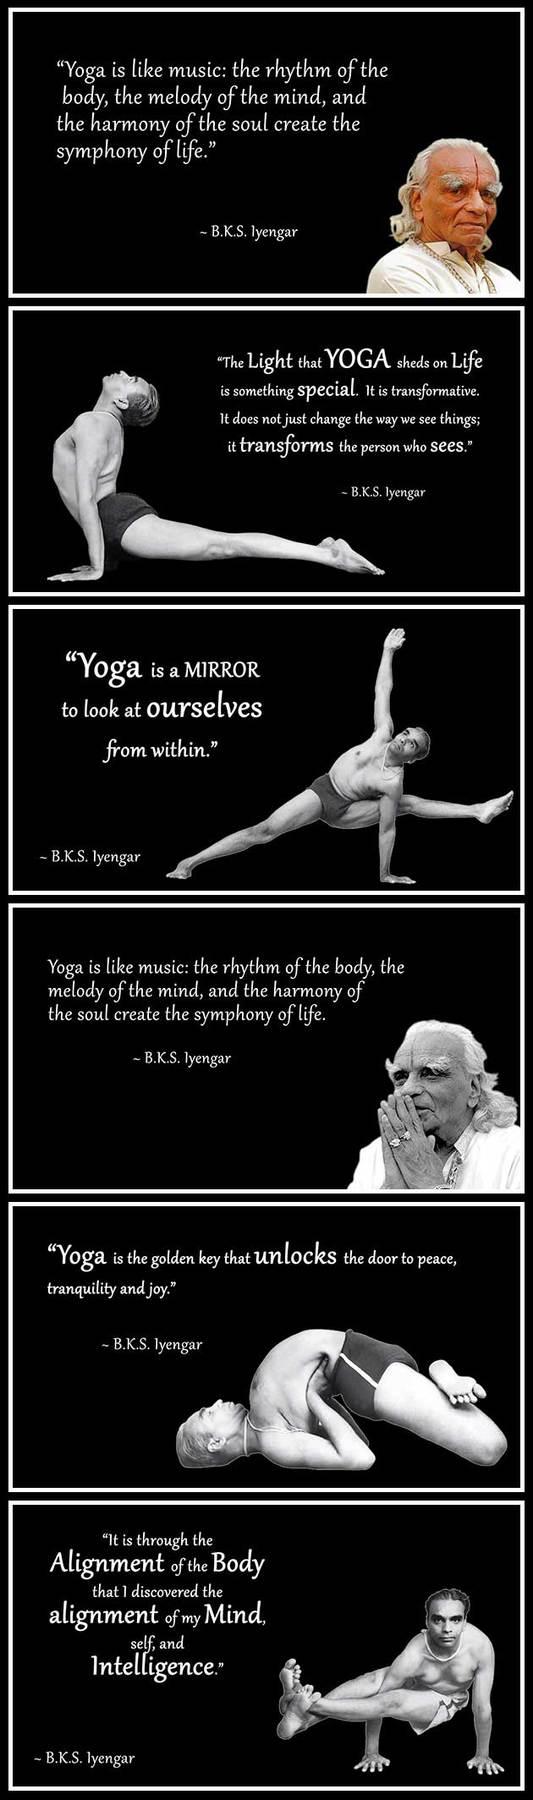 BKS, Iyengar, quotes, yoga, best, top, inspiring, quote